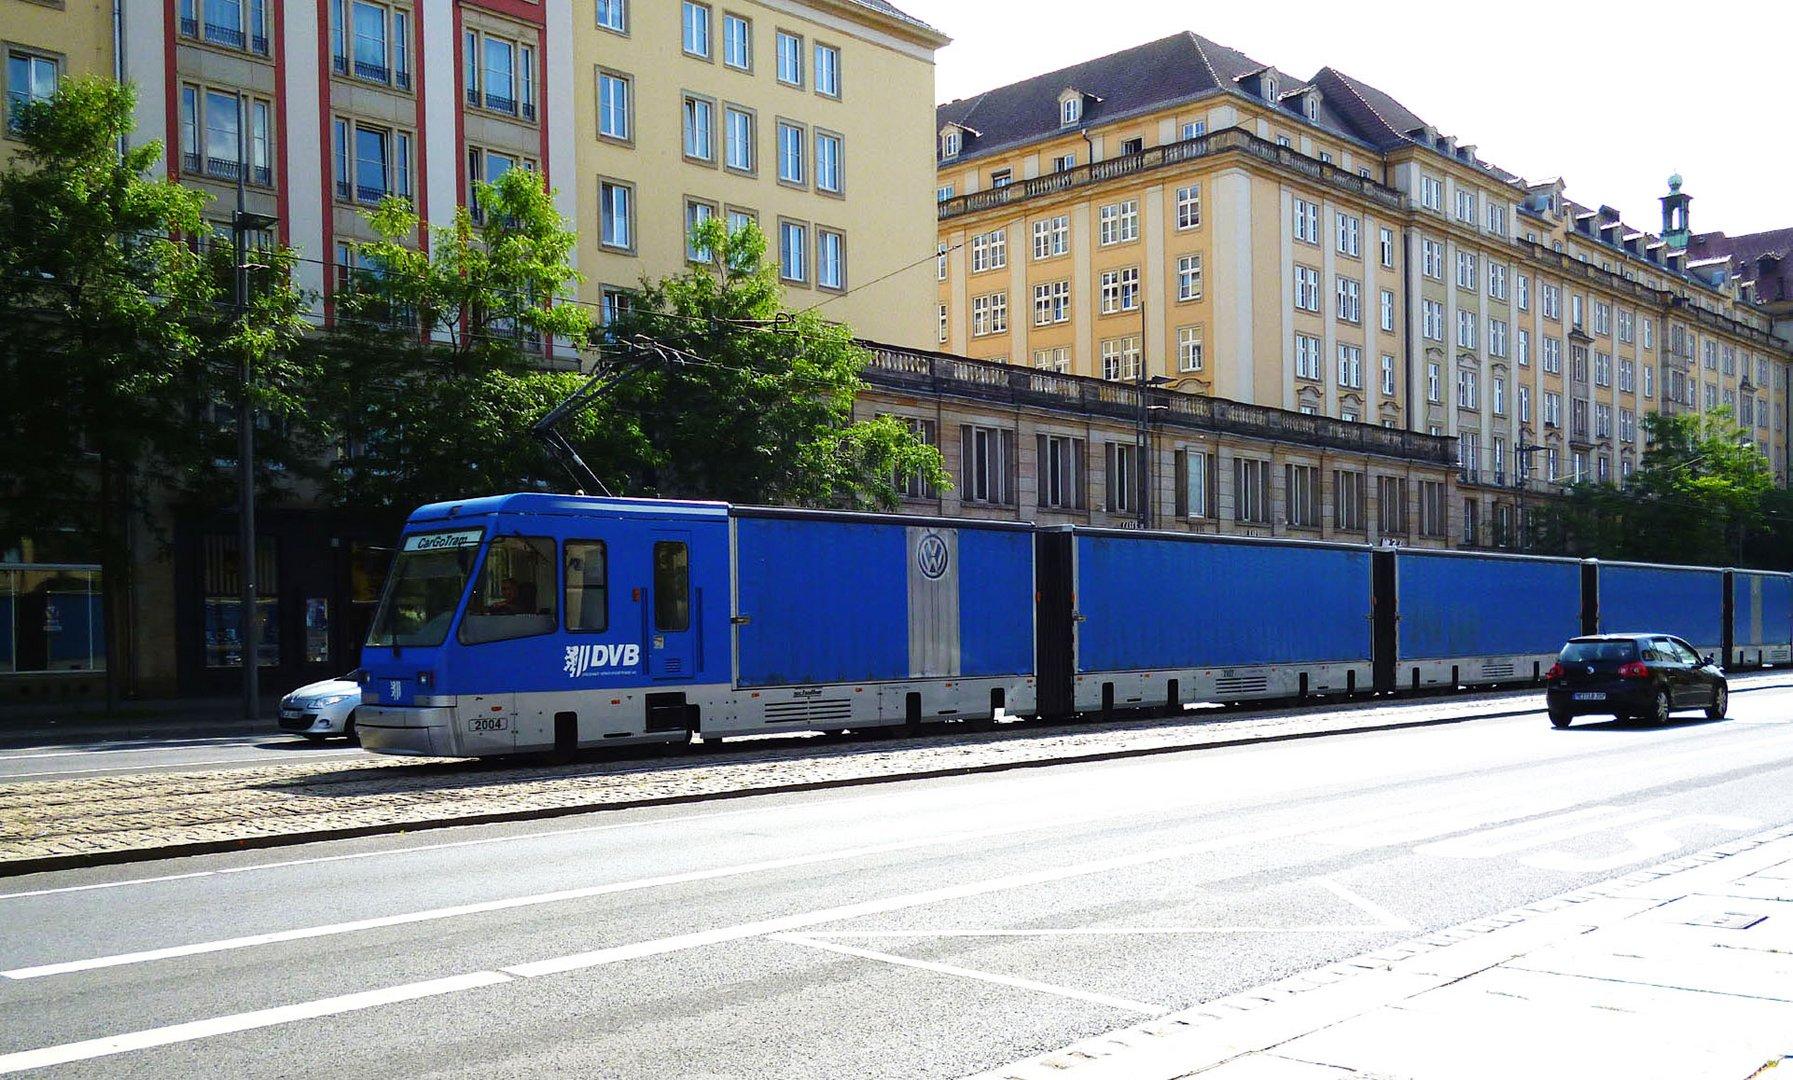 CarGo-Tram